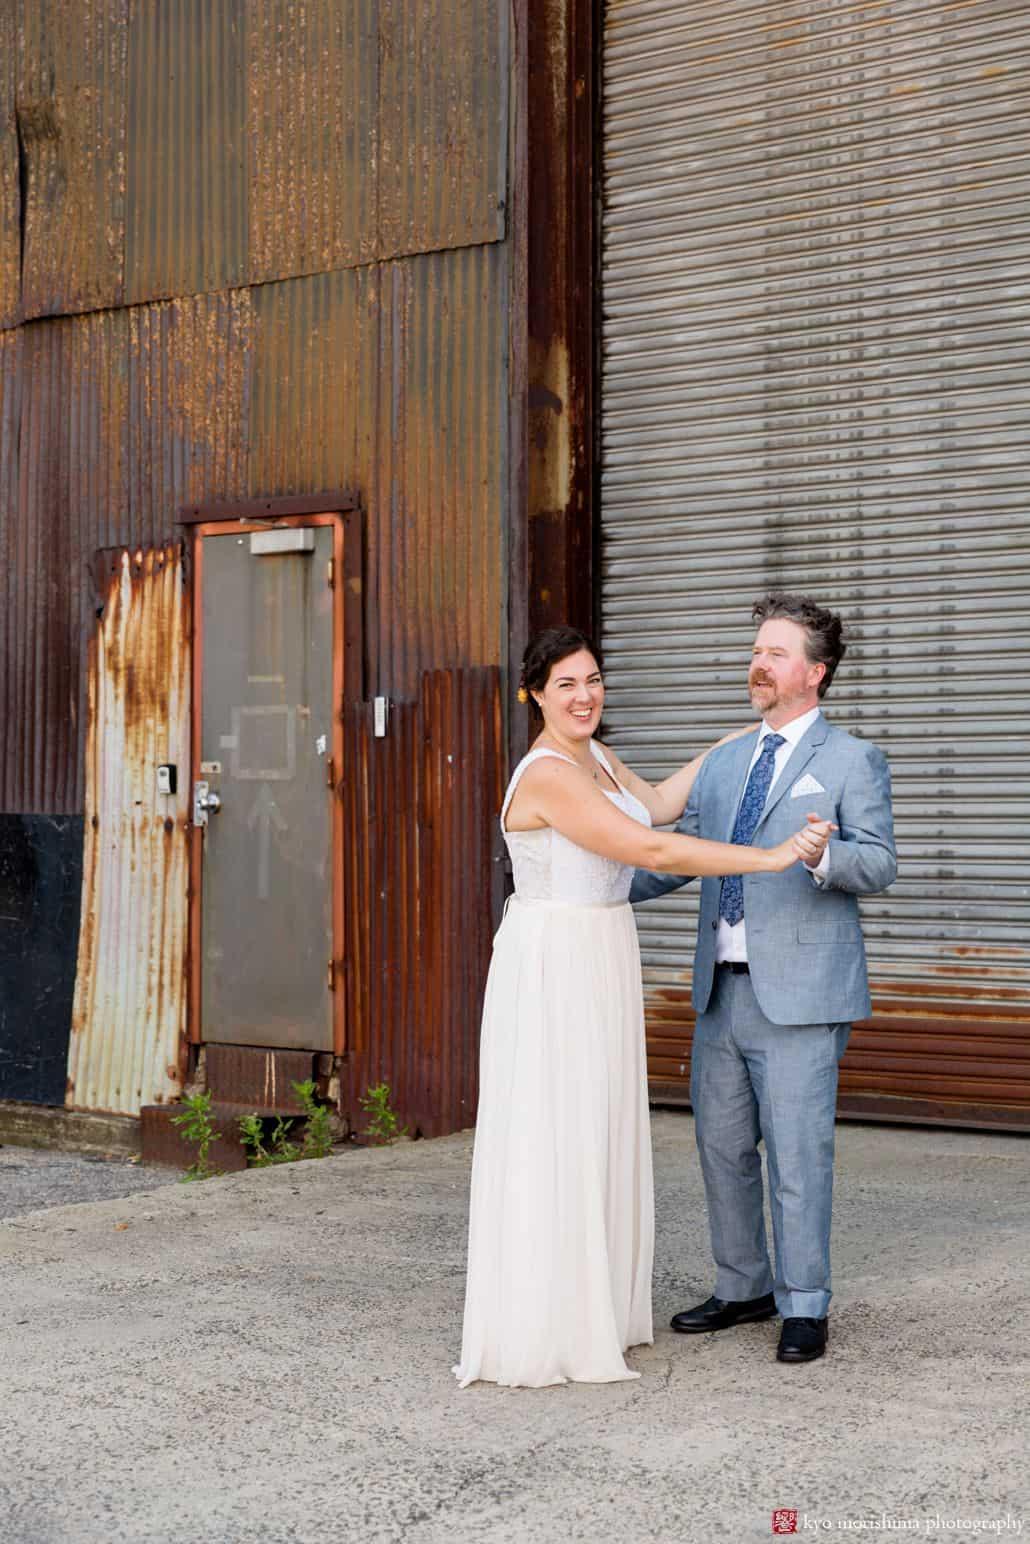 Places to take wedding photos in Brooklyn: the Brooklyn Navy Yard